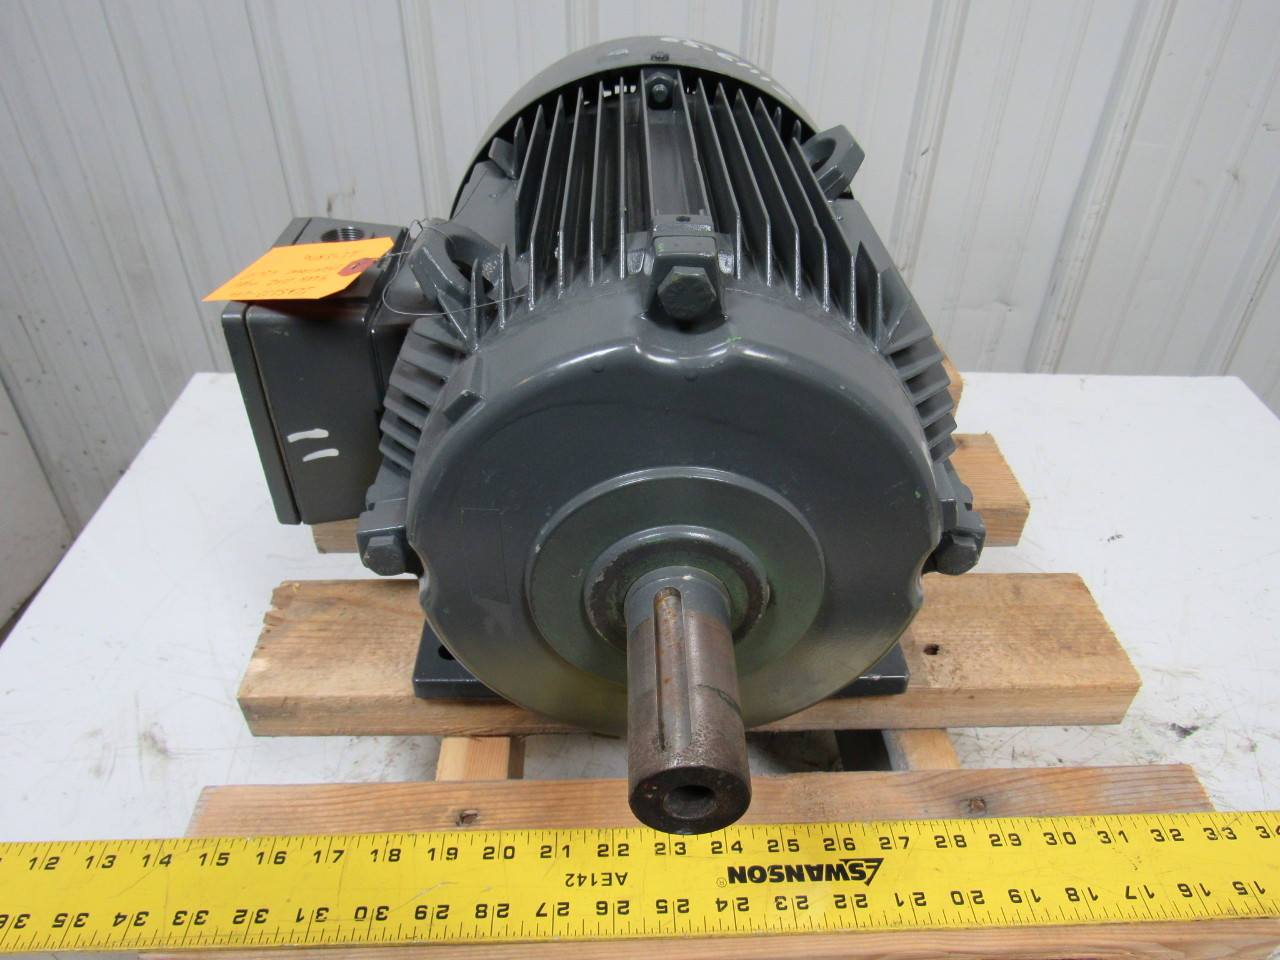 Siemens 1la5133 6aa Electric Motor 3ph 4 6kw 440v: 1 kw electric motor